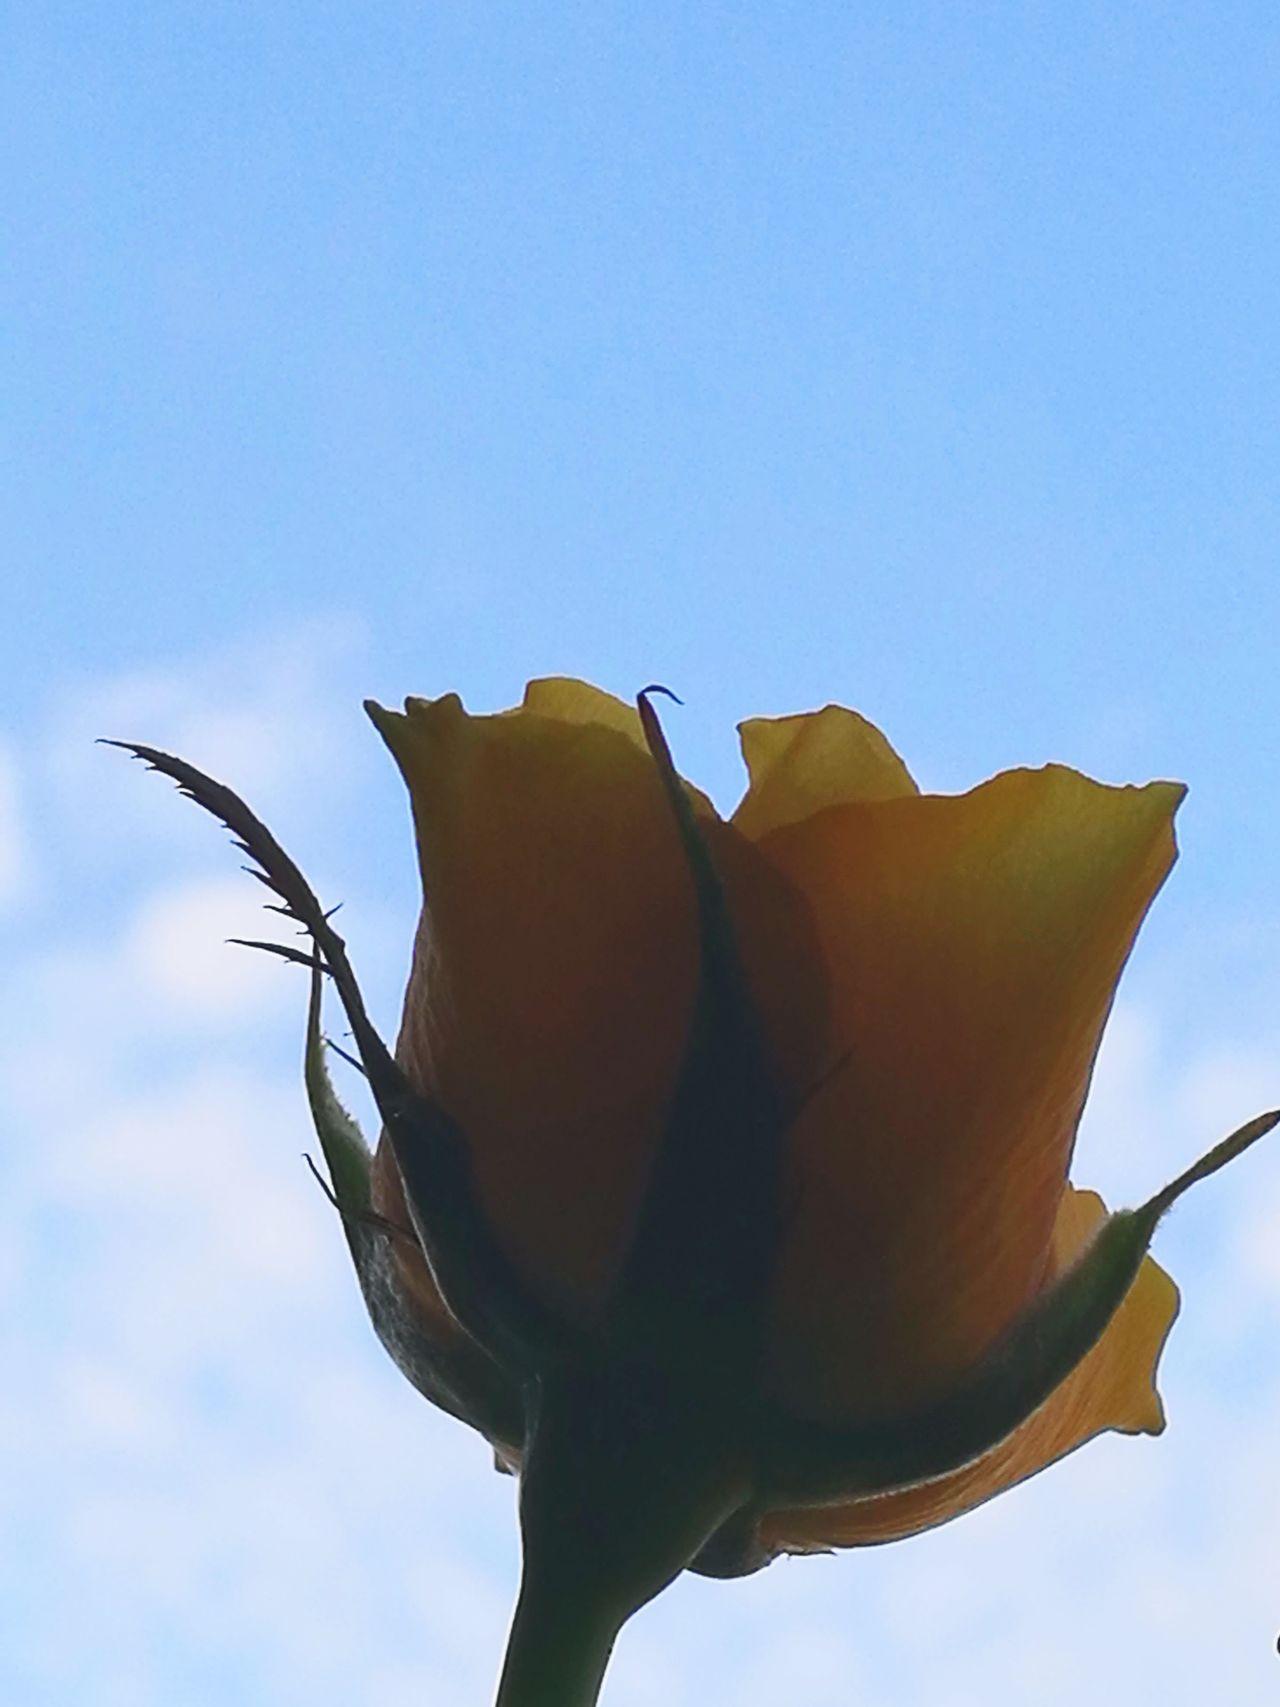 Sky No People Nature Day Blue Sky Bird Outdoors Yellow Flower Yellow Rose Beautiful Scene